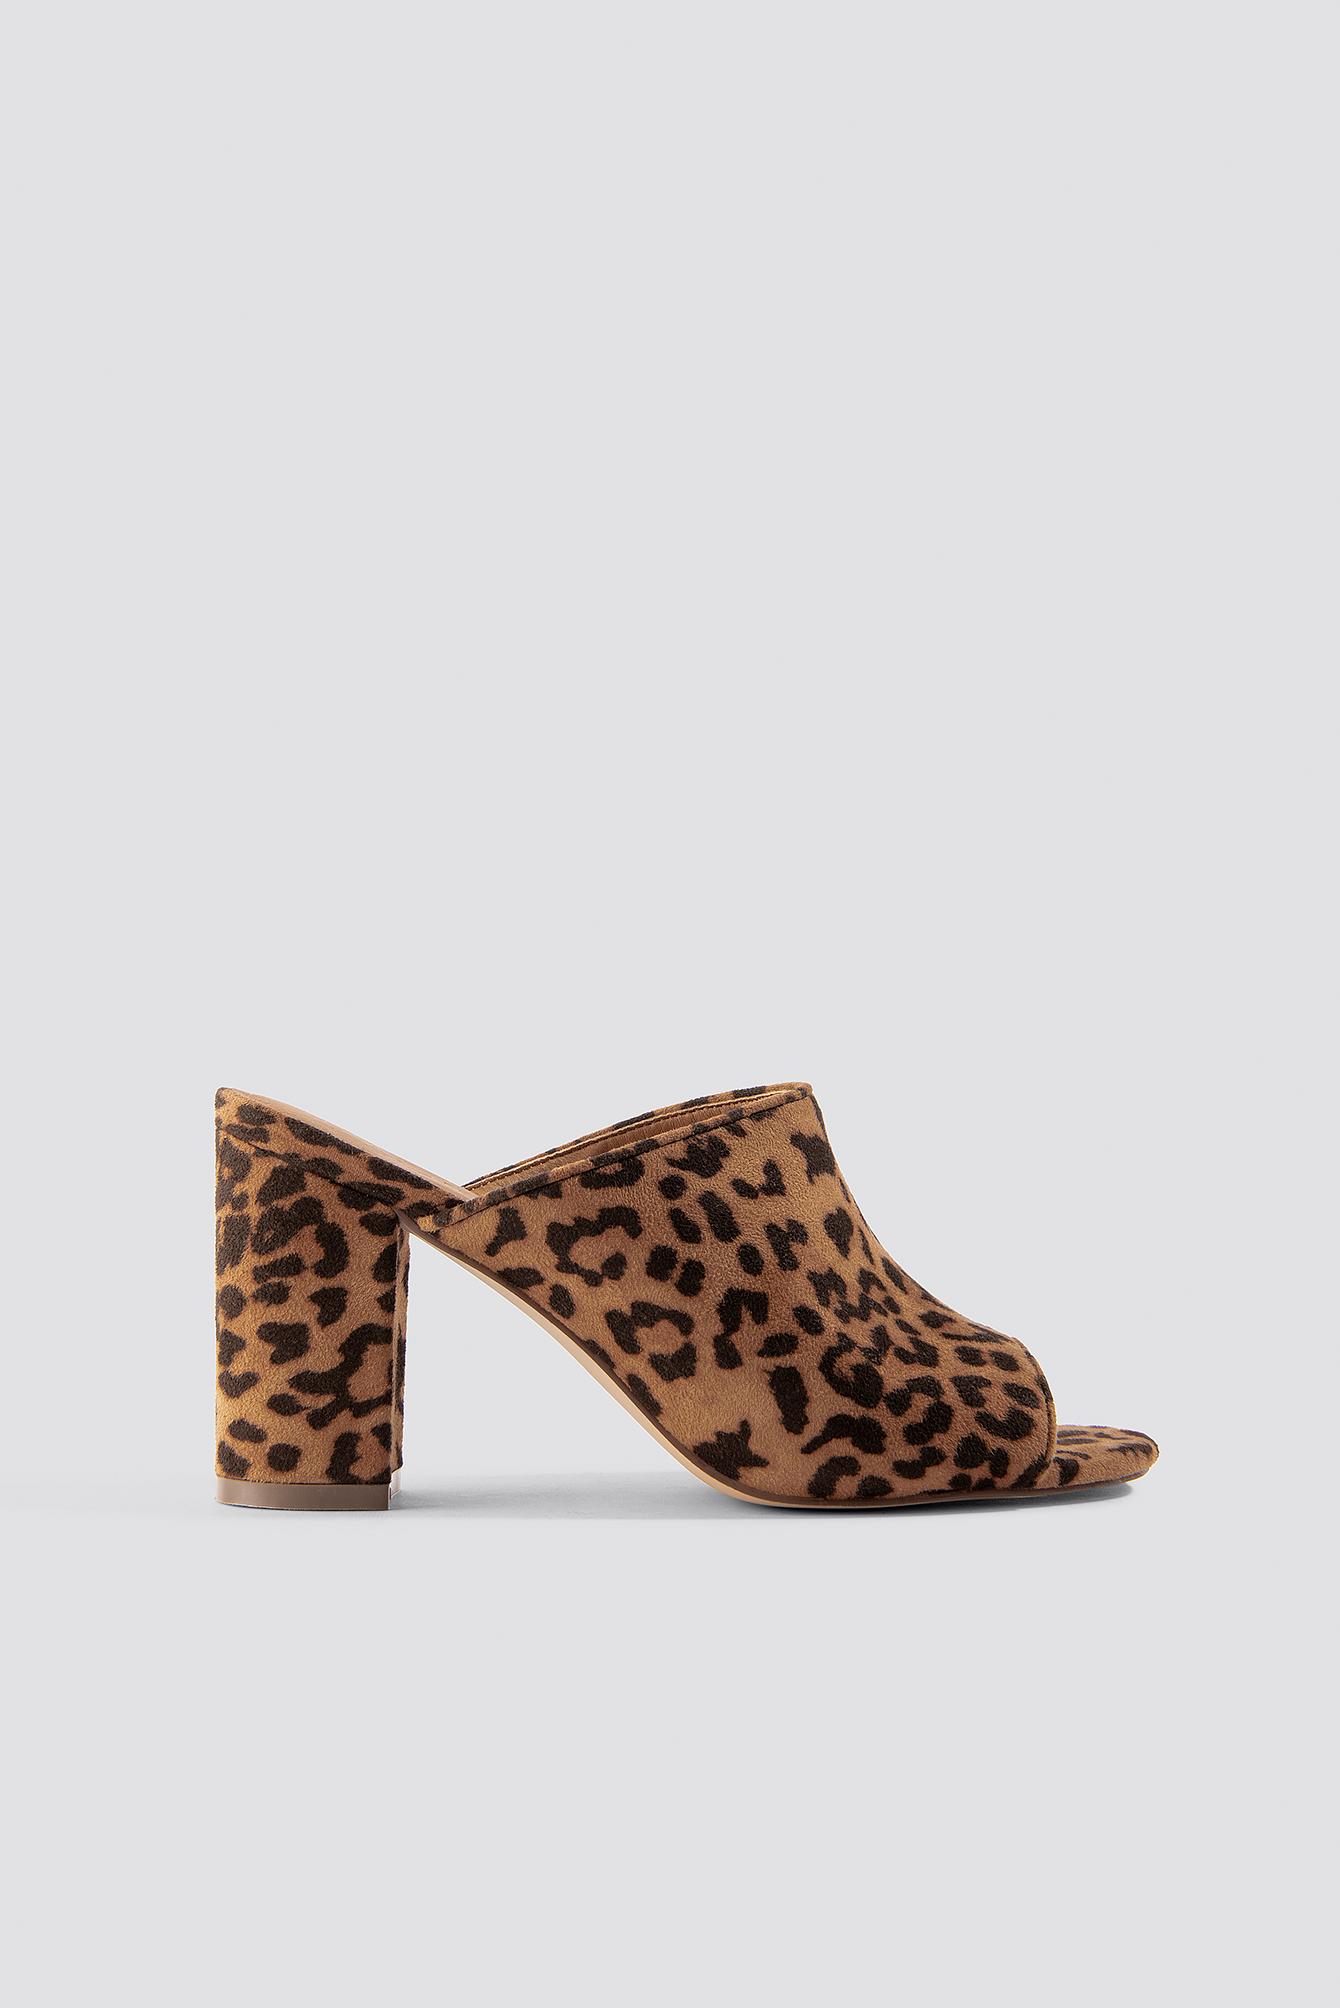 na-kd shoes -  Leopard Block Heel Mules - Brown